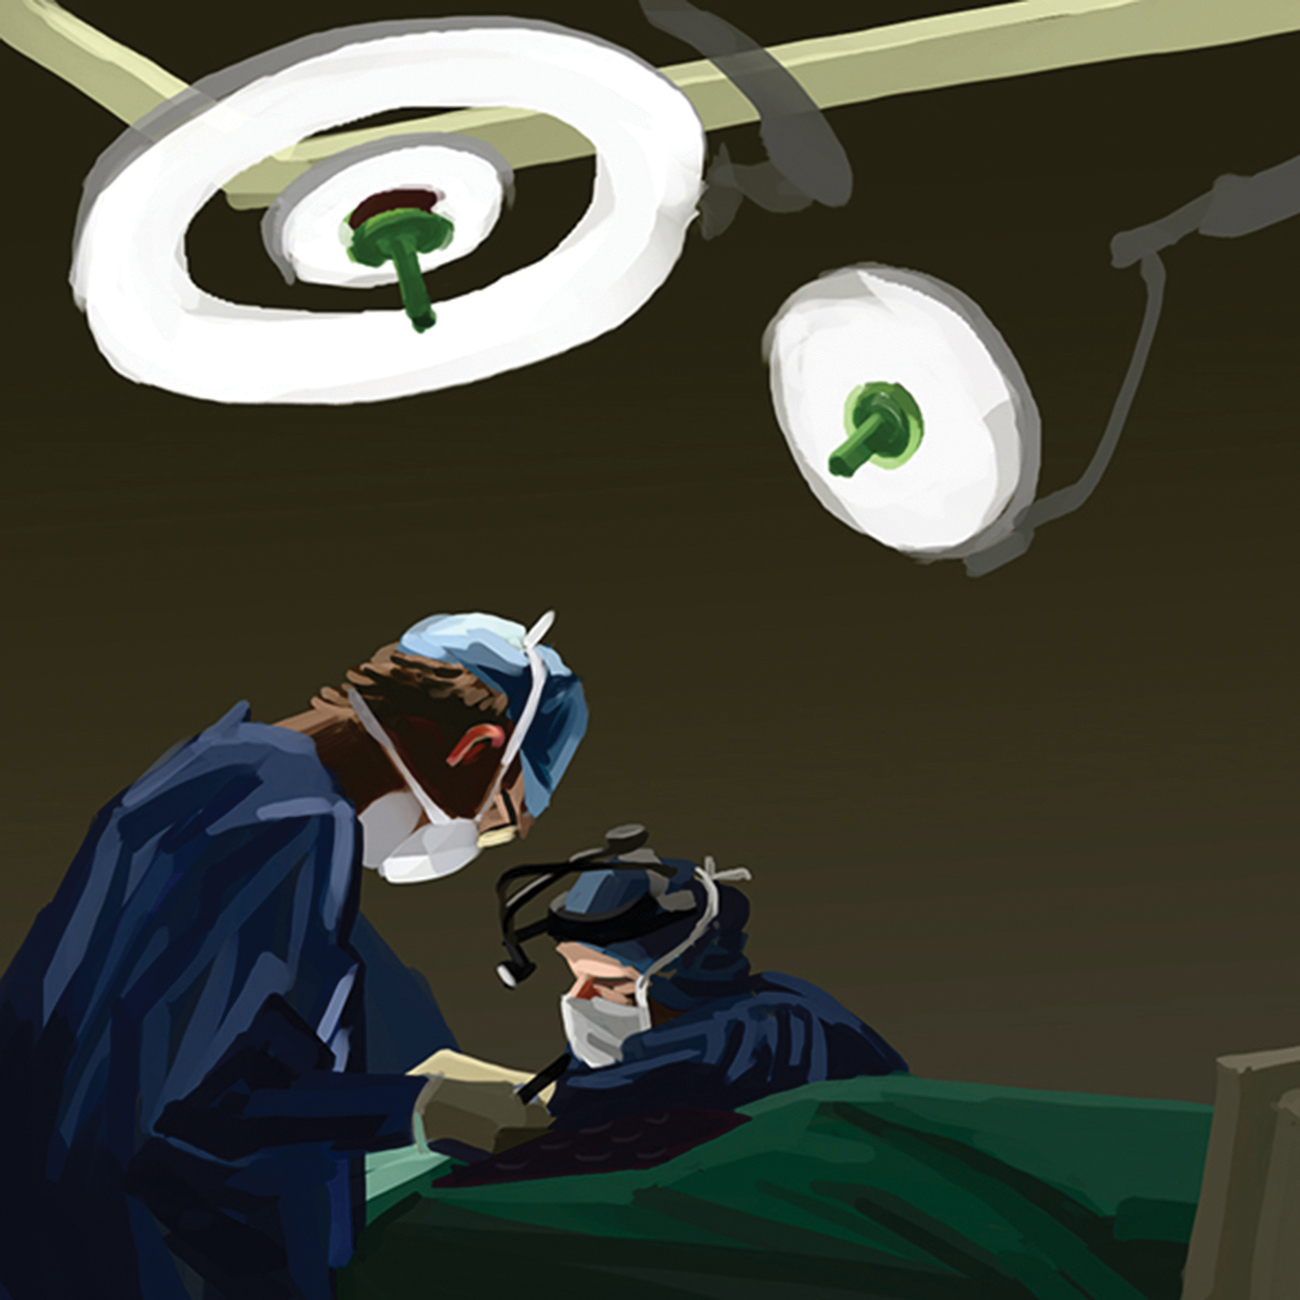 Illustrations for Ninewells Hospital